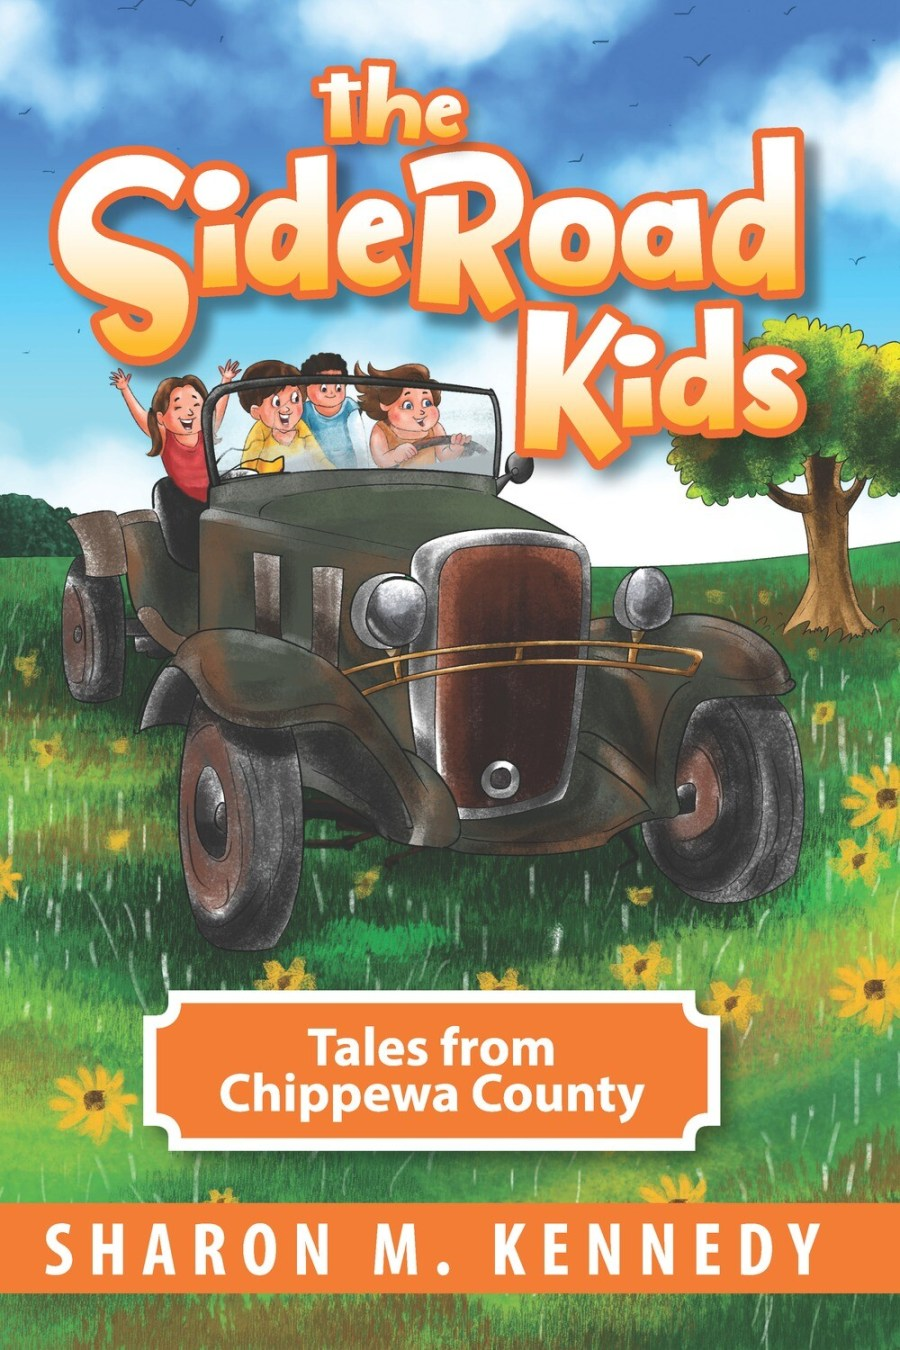 The SideRoad Kids